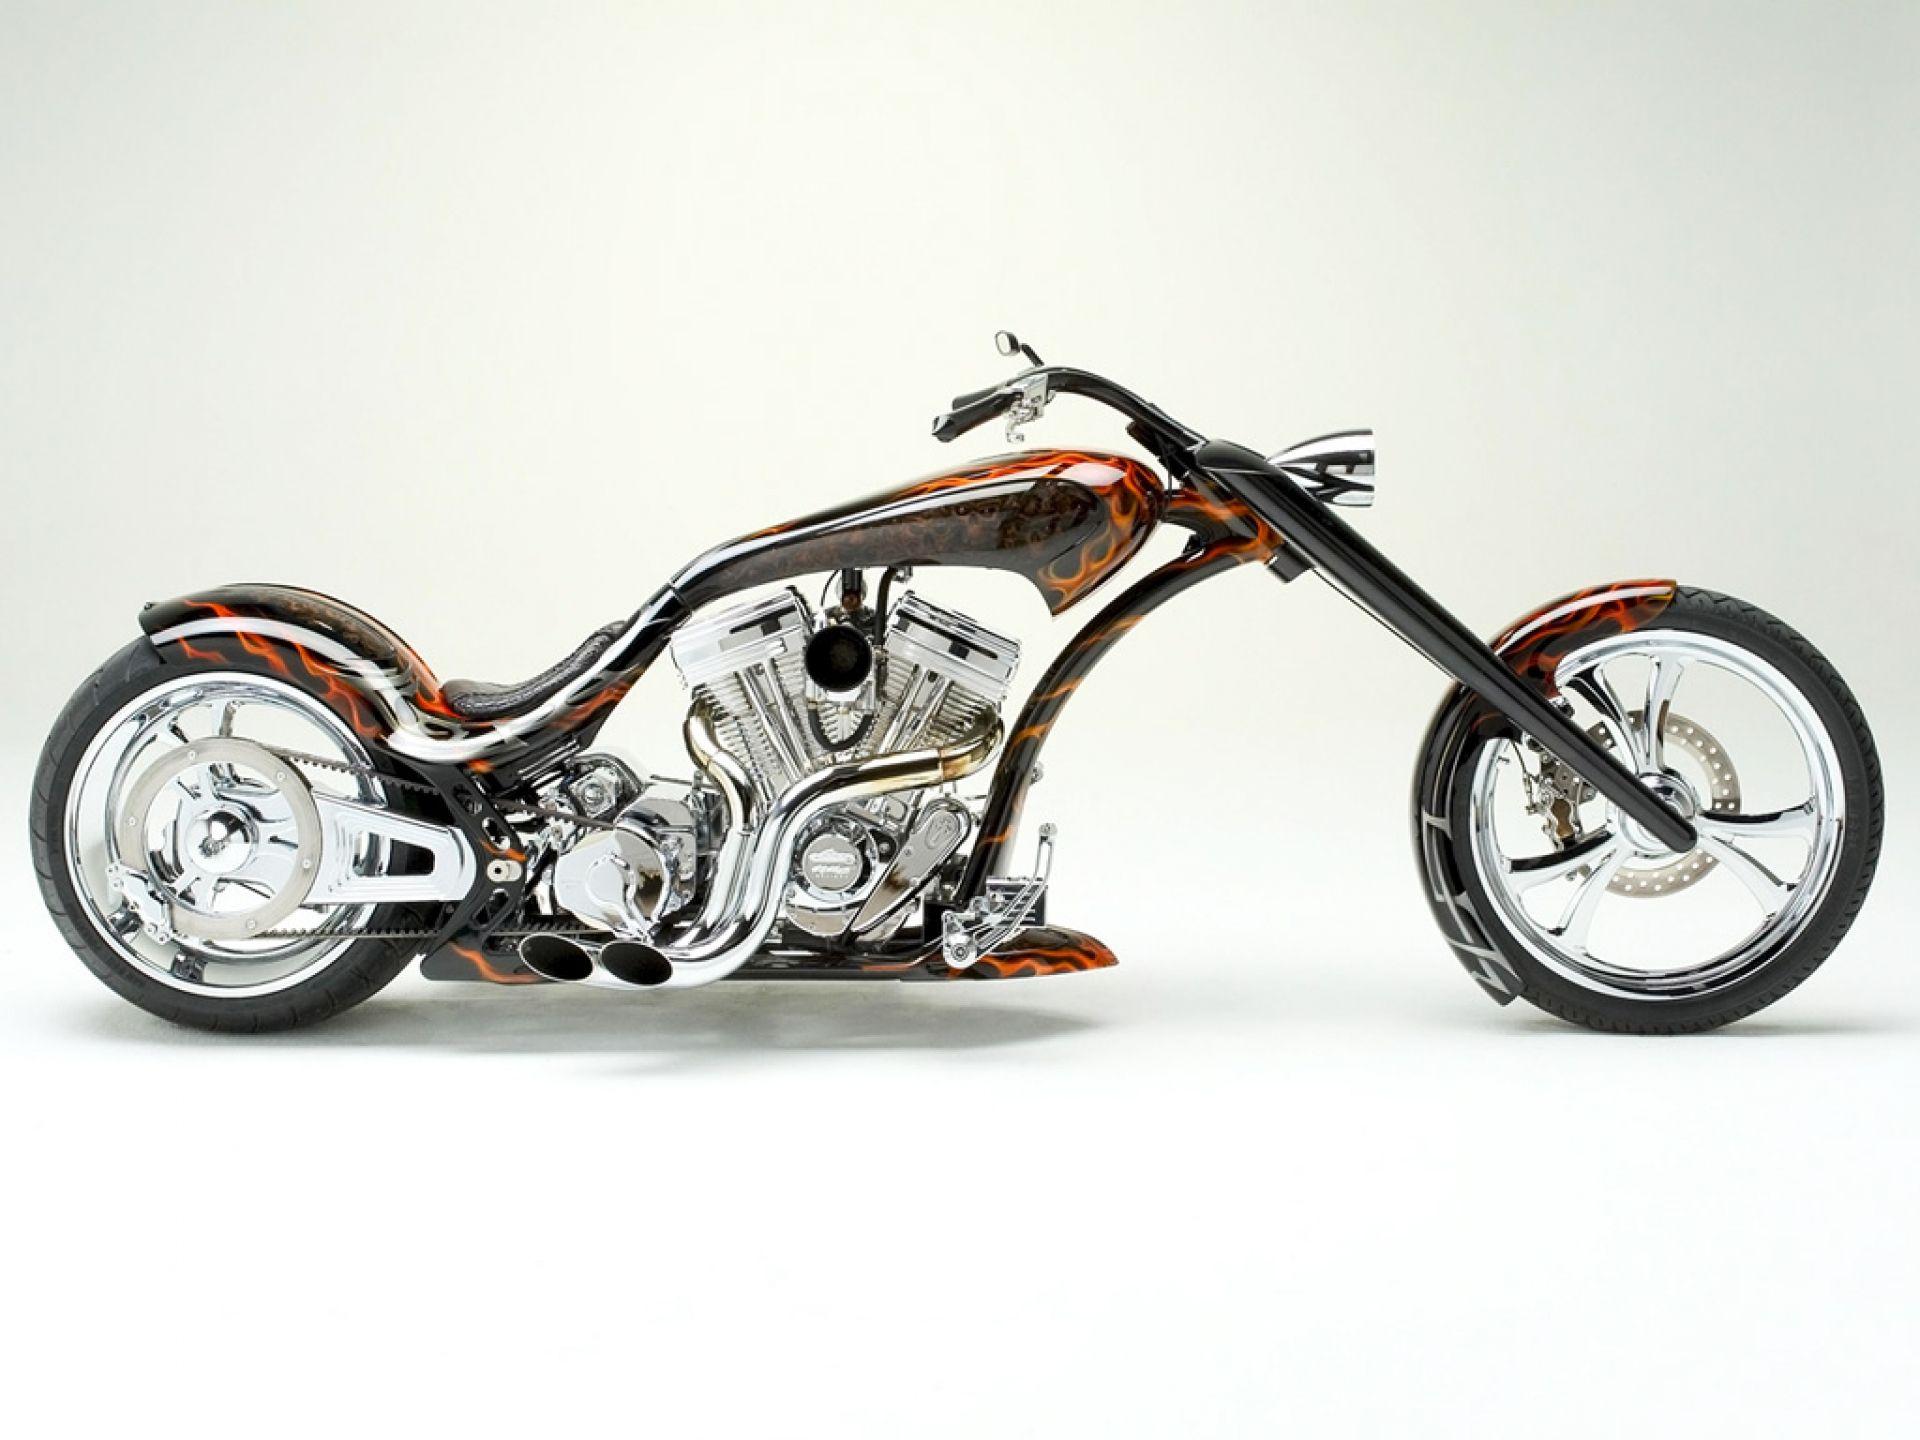 Motocykle choppery